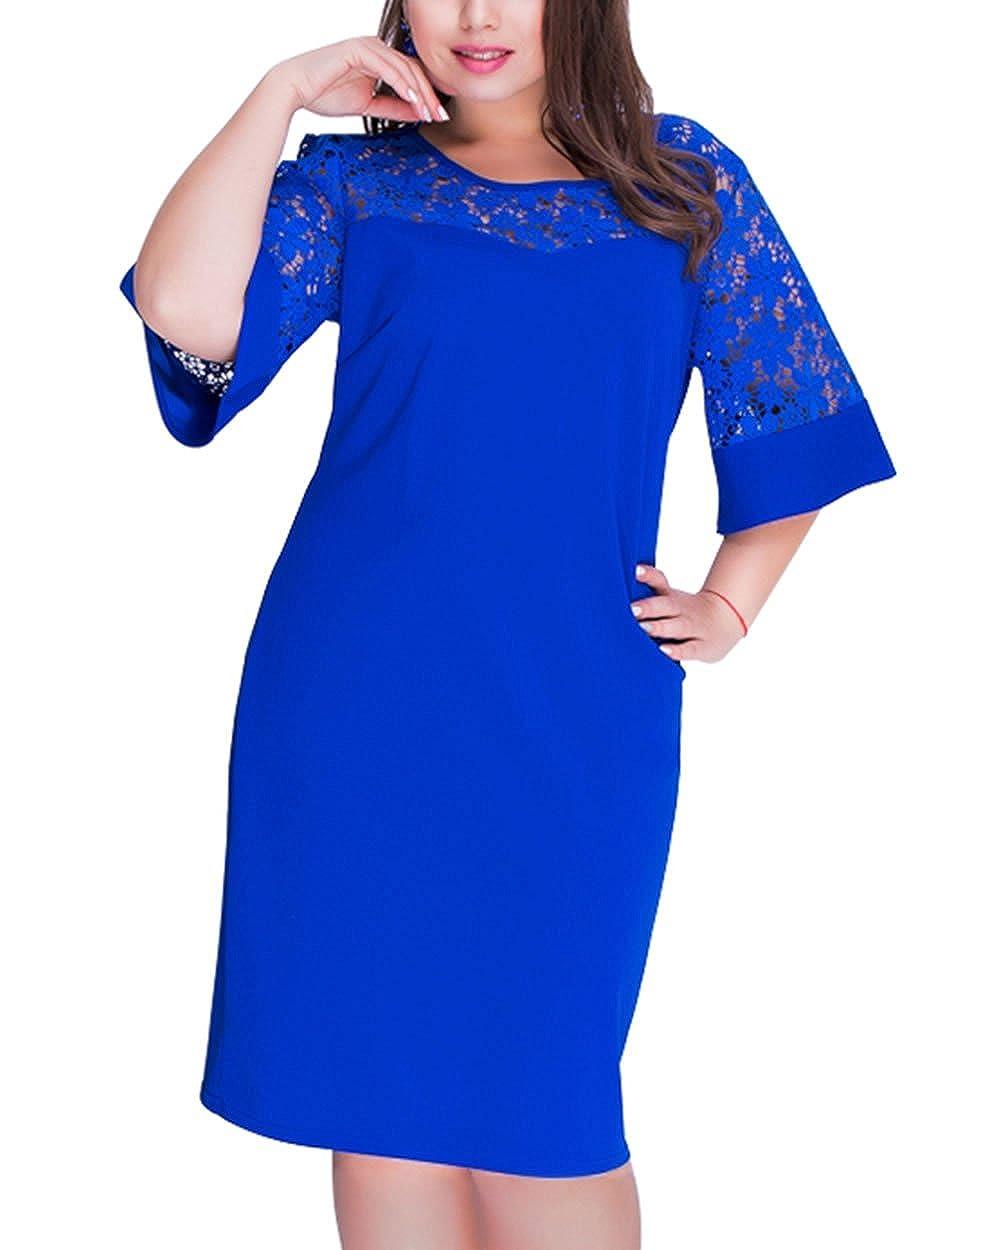 b892566e46d65 1.US Plus size:14W 16W 18W 20W. 2.Feature:Plus Size Lace Dress,Big size  Dress,half Sleeve Dress,Casual Dress,Elegant Dress,Office  Dress,O-Neck,solid Dress